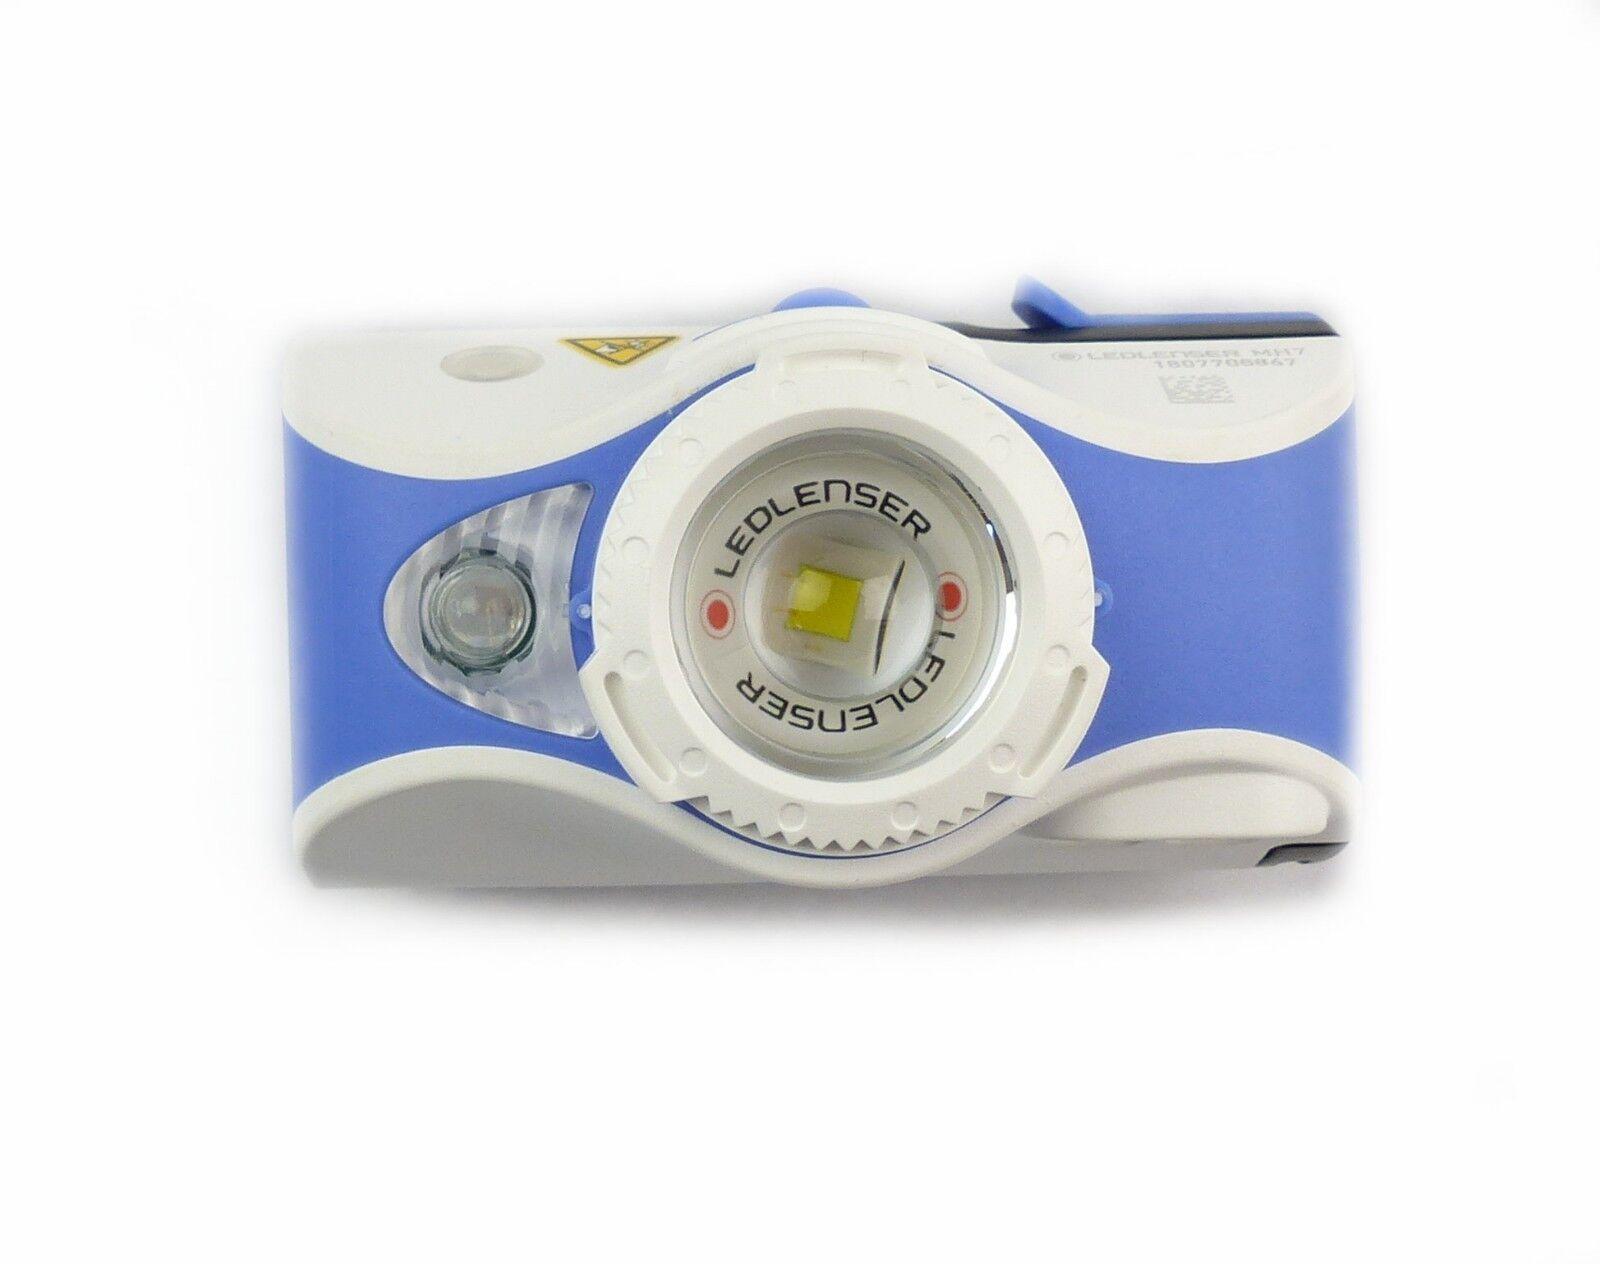 Ledlenser 500992 LED Kopflampe Stirnlampe MH7 MH7 MH7 Blau Weiß 600 Lumen mit Akku 86ca9a